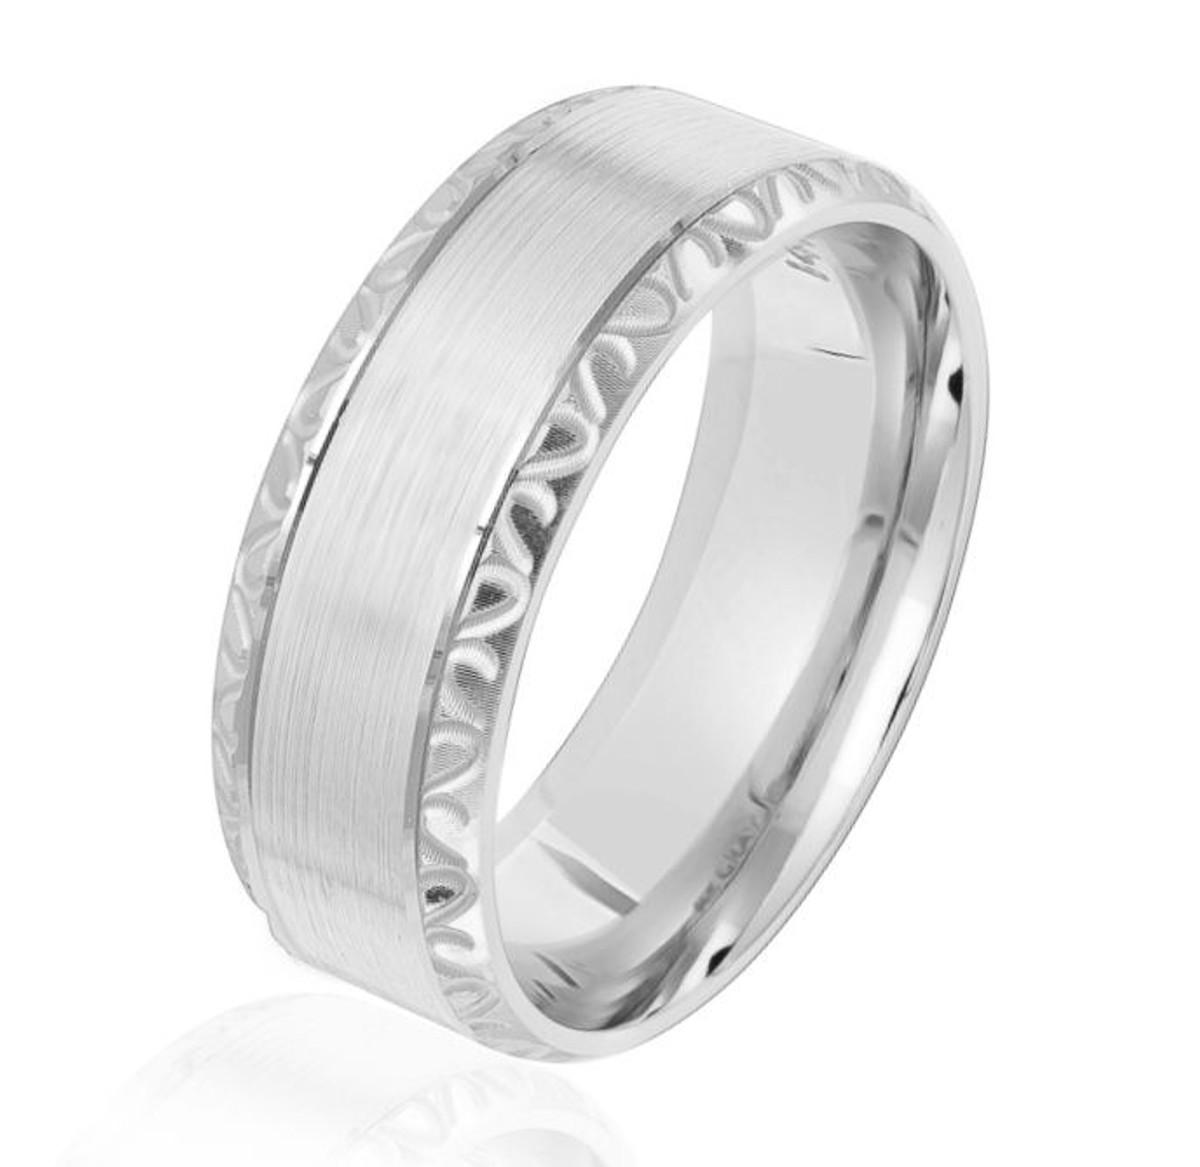 White Gold Beveled Wedding Ring